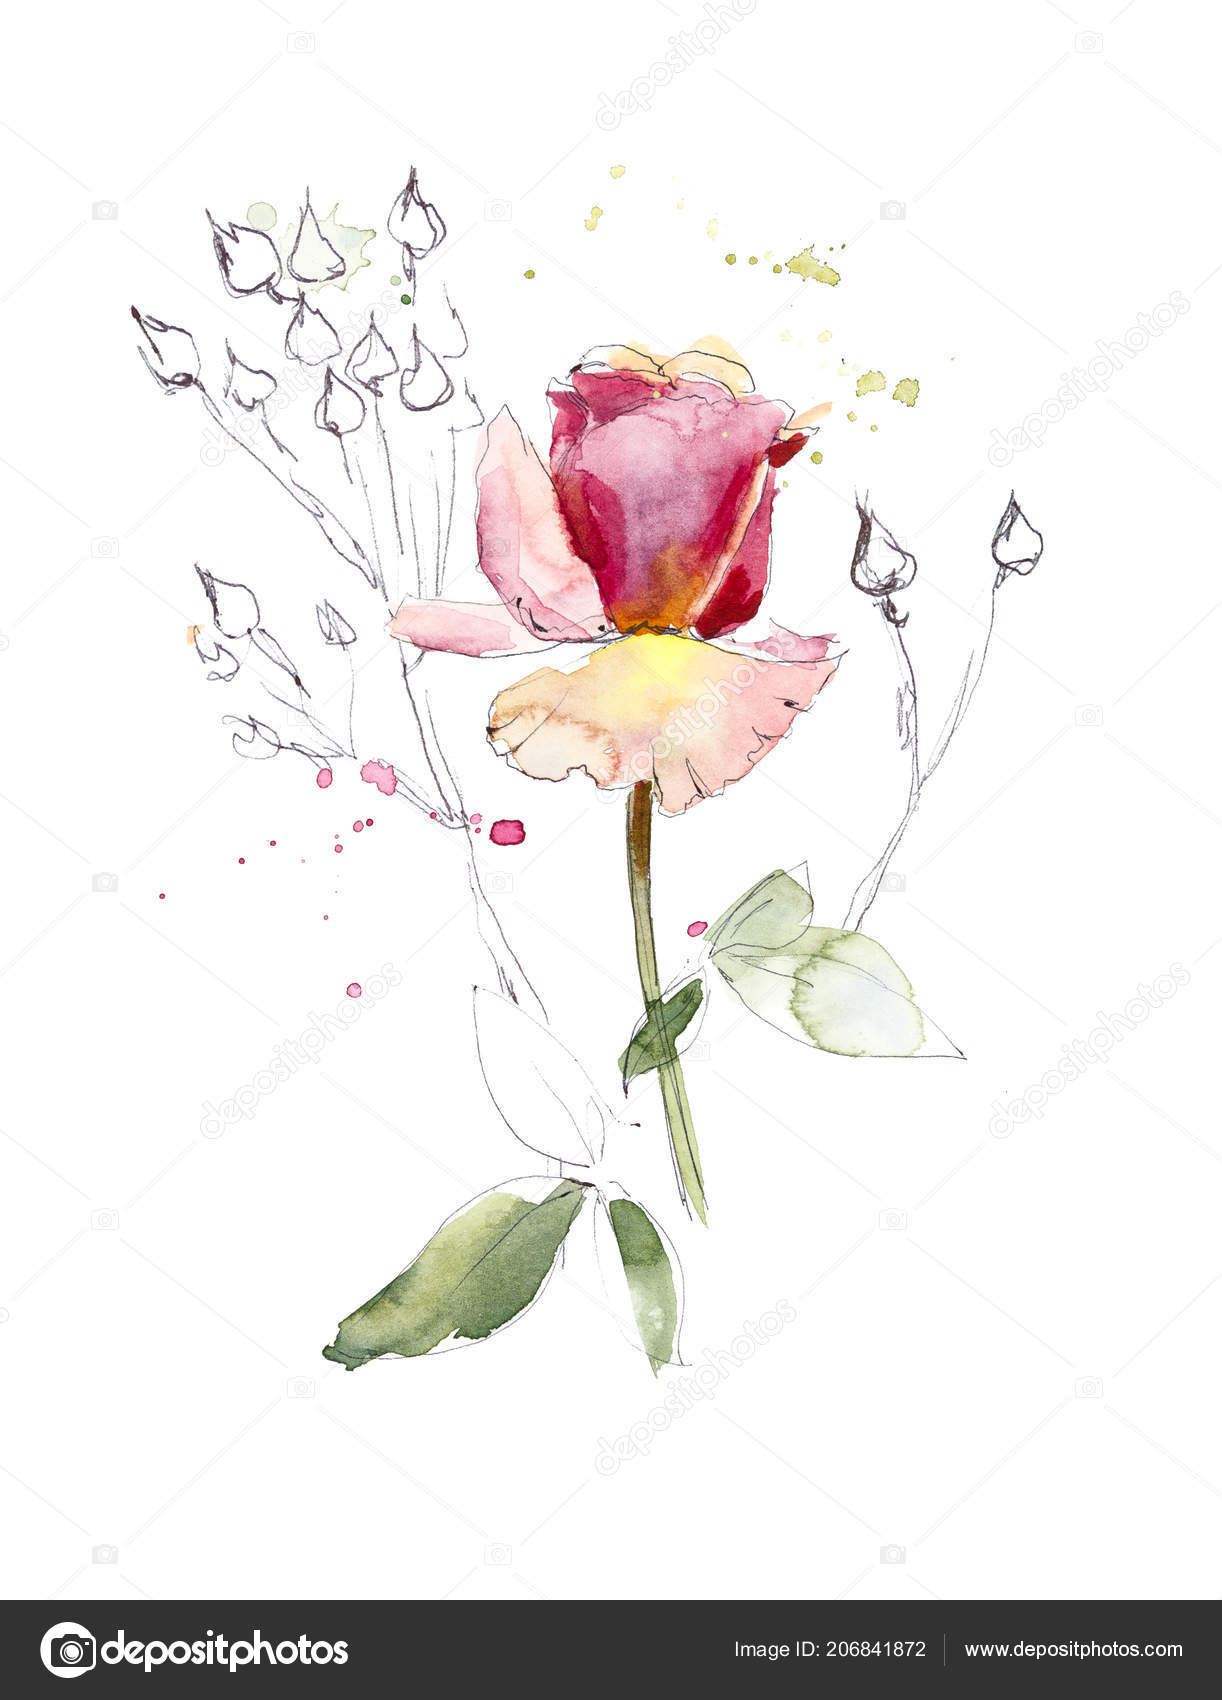 Motif Rose Rose Dessins Mariage Peinture Aquarelle Cartes Voeux